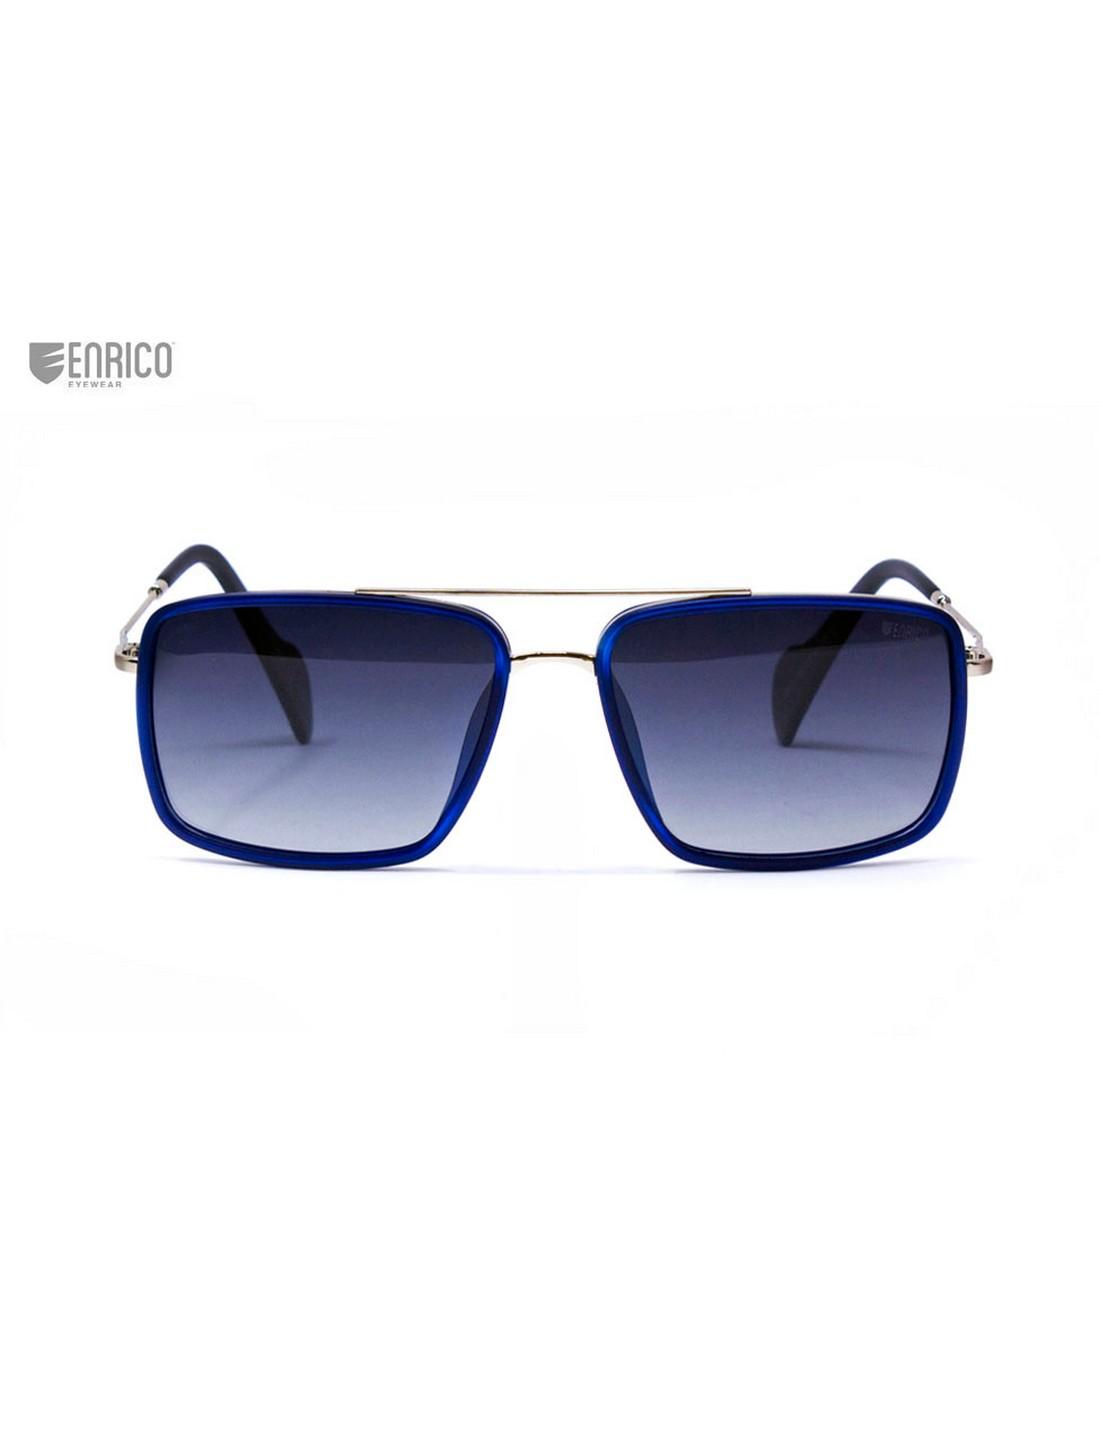 ENRICO | ENRICO Snapper UV Protected & Polarized Square Shape Sunglasses for Men ( Lens - Blue | Frame - Blue)